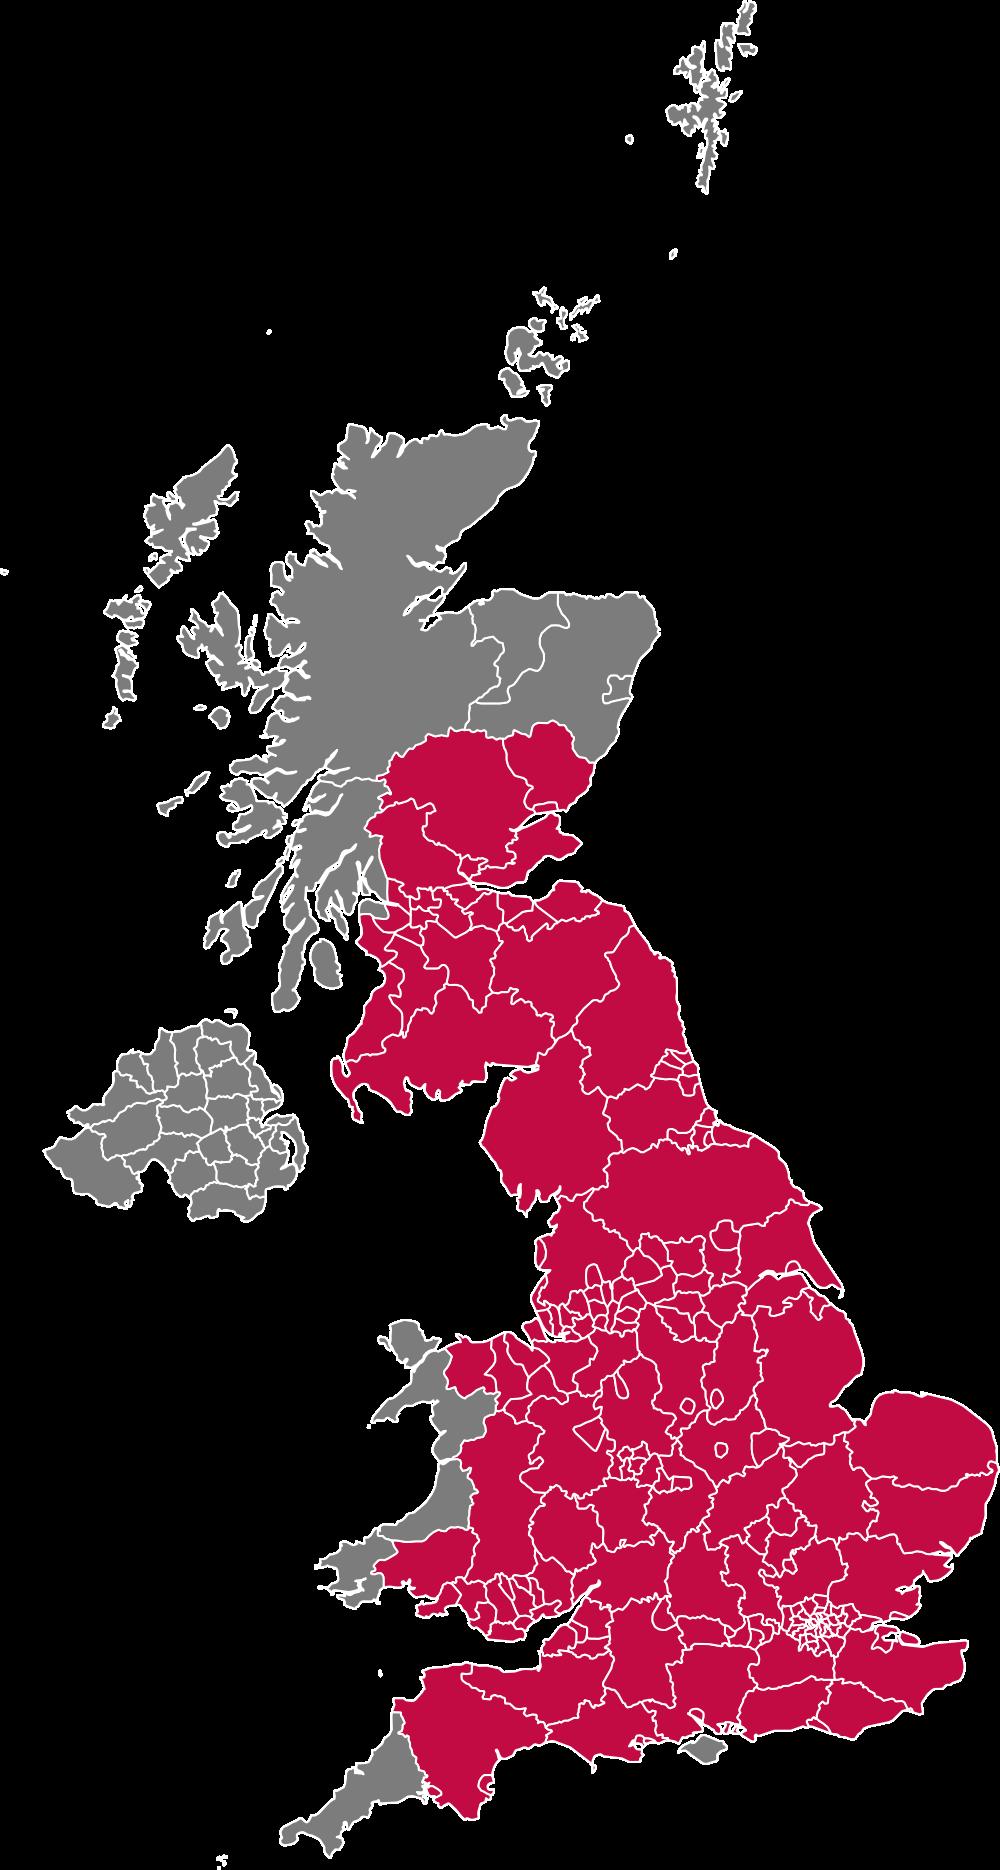 Map of mainland UK